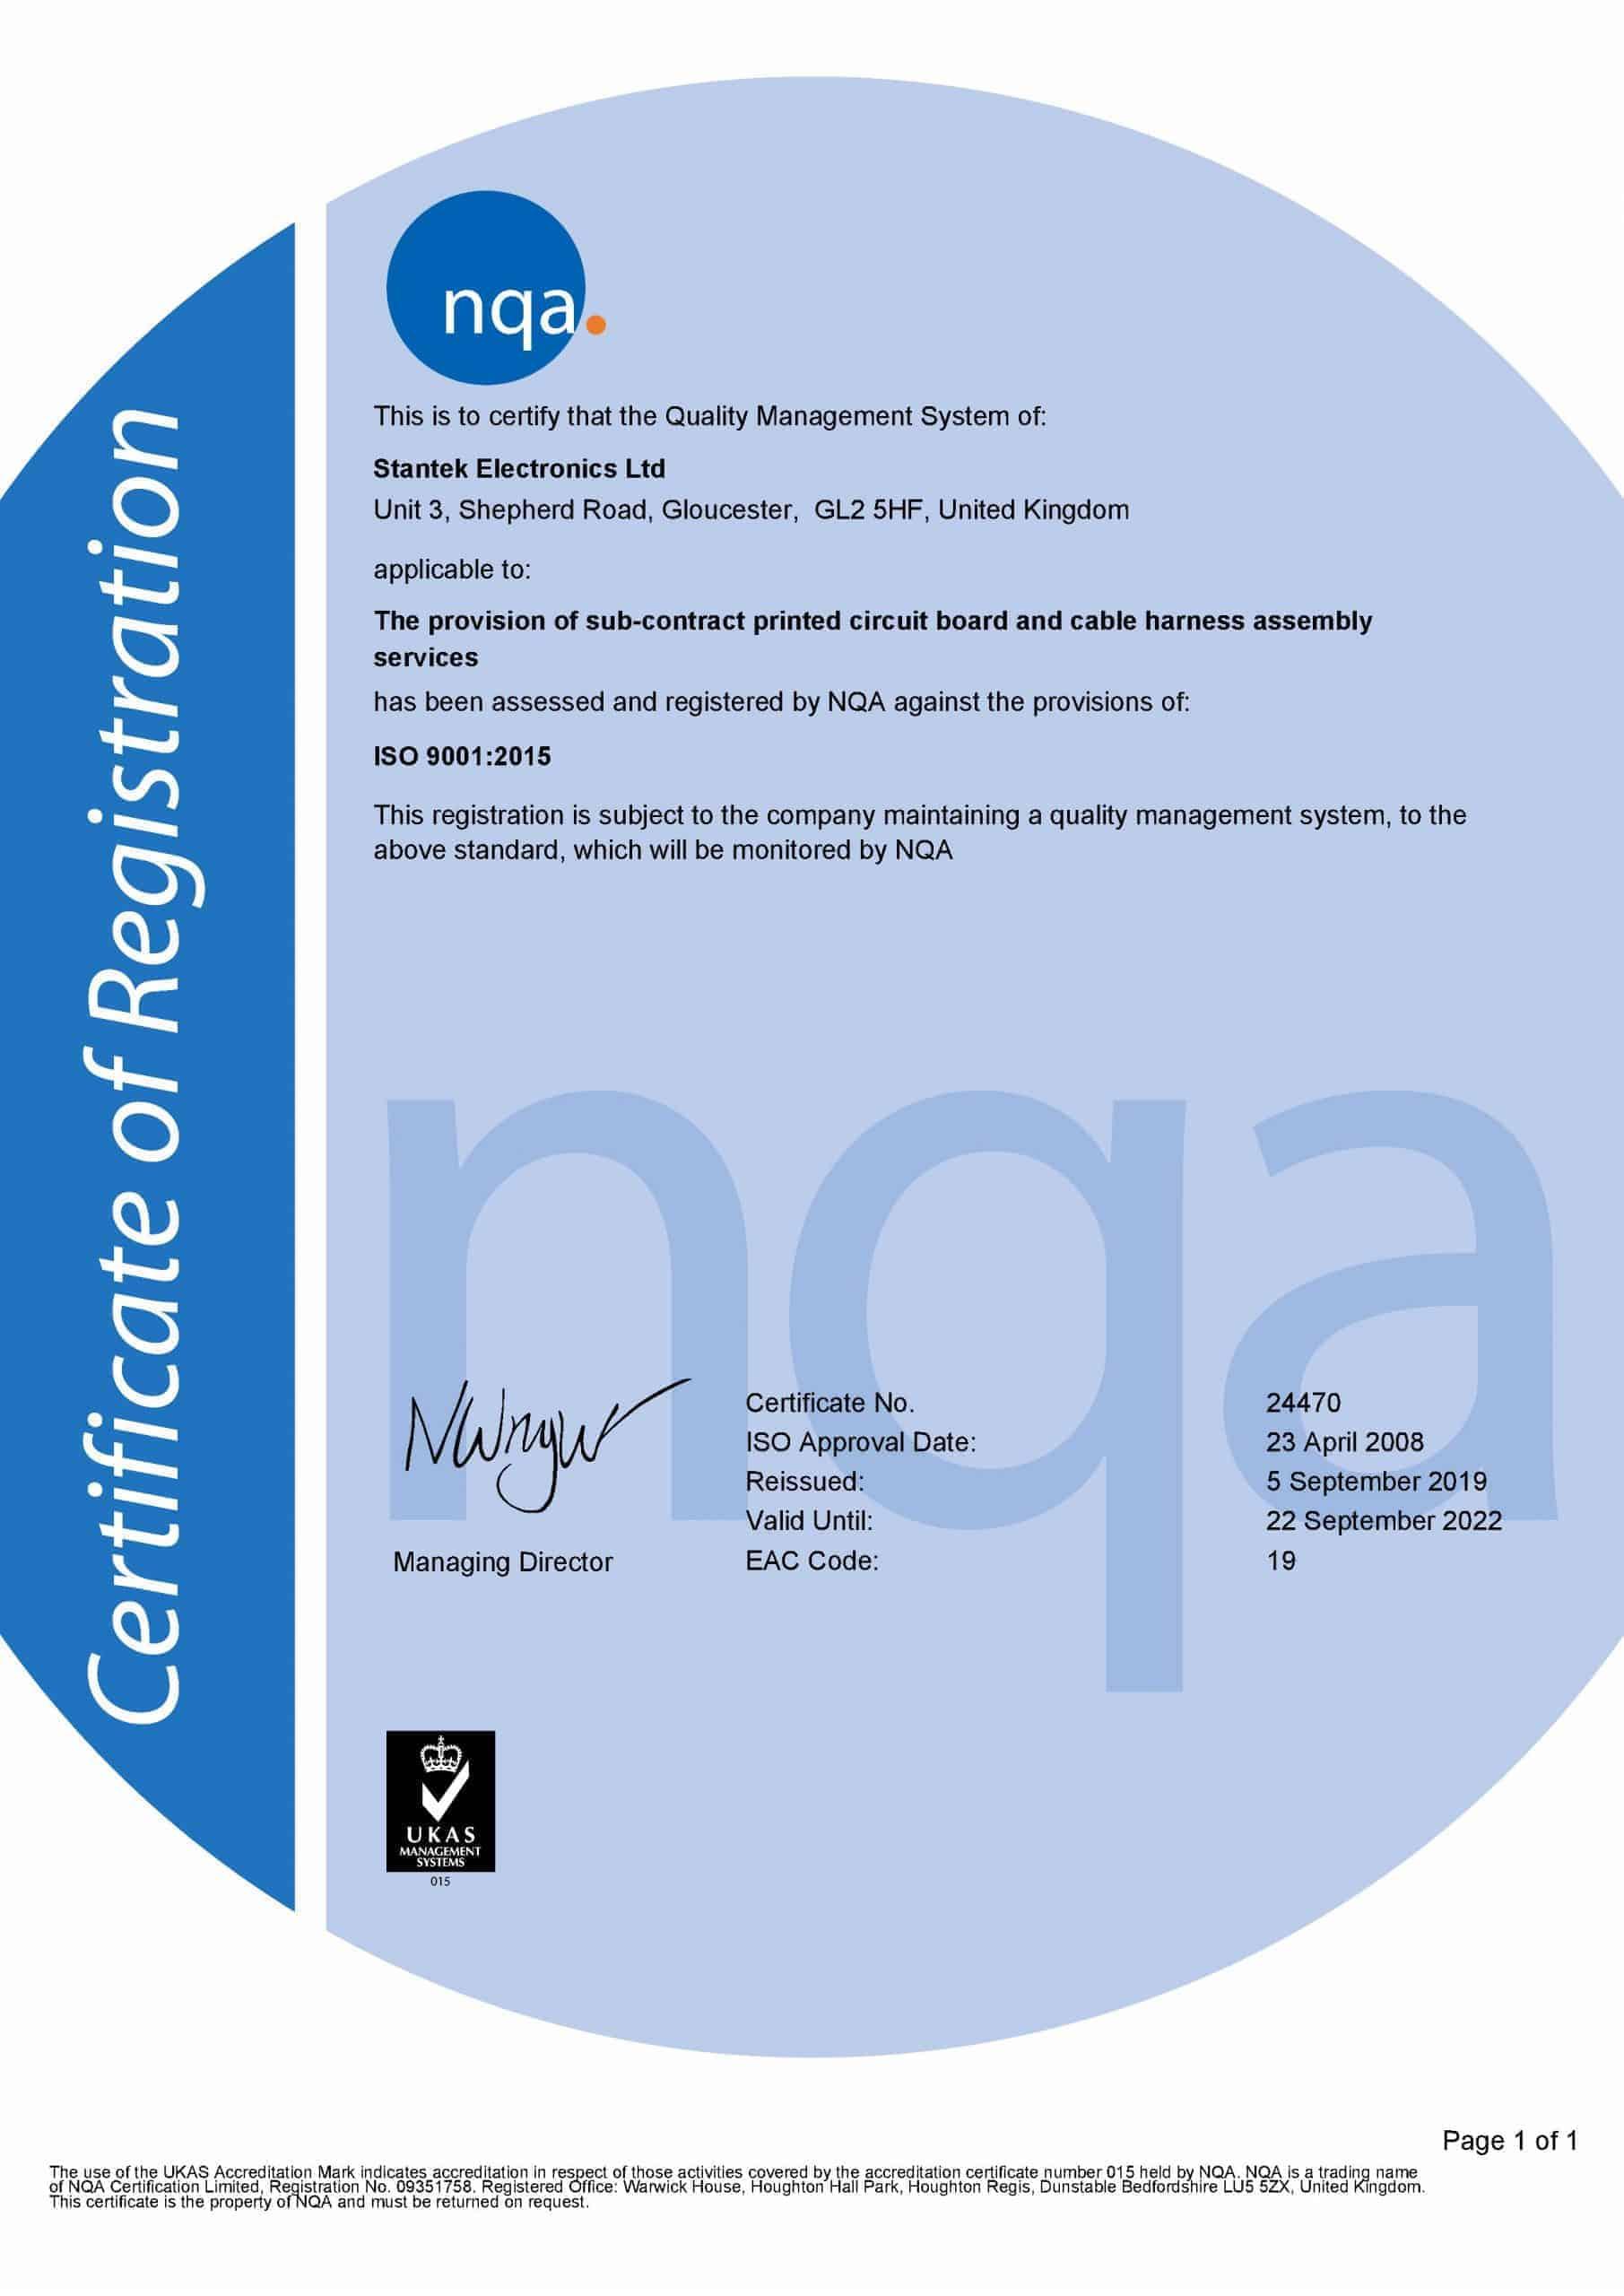 nqa certificate of registration